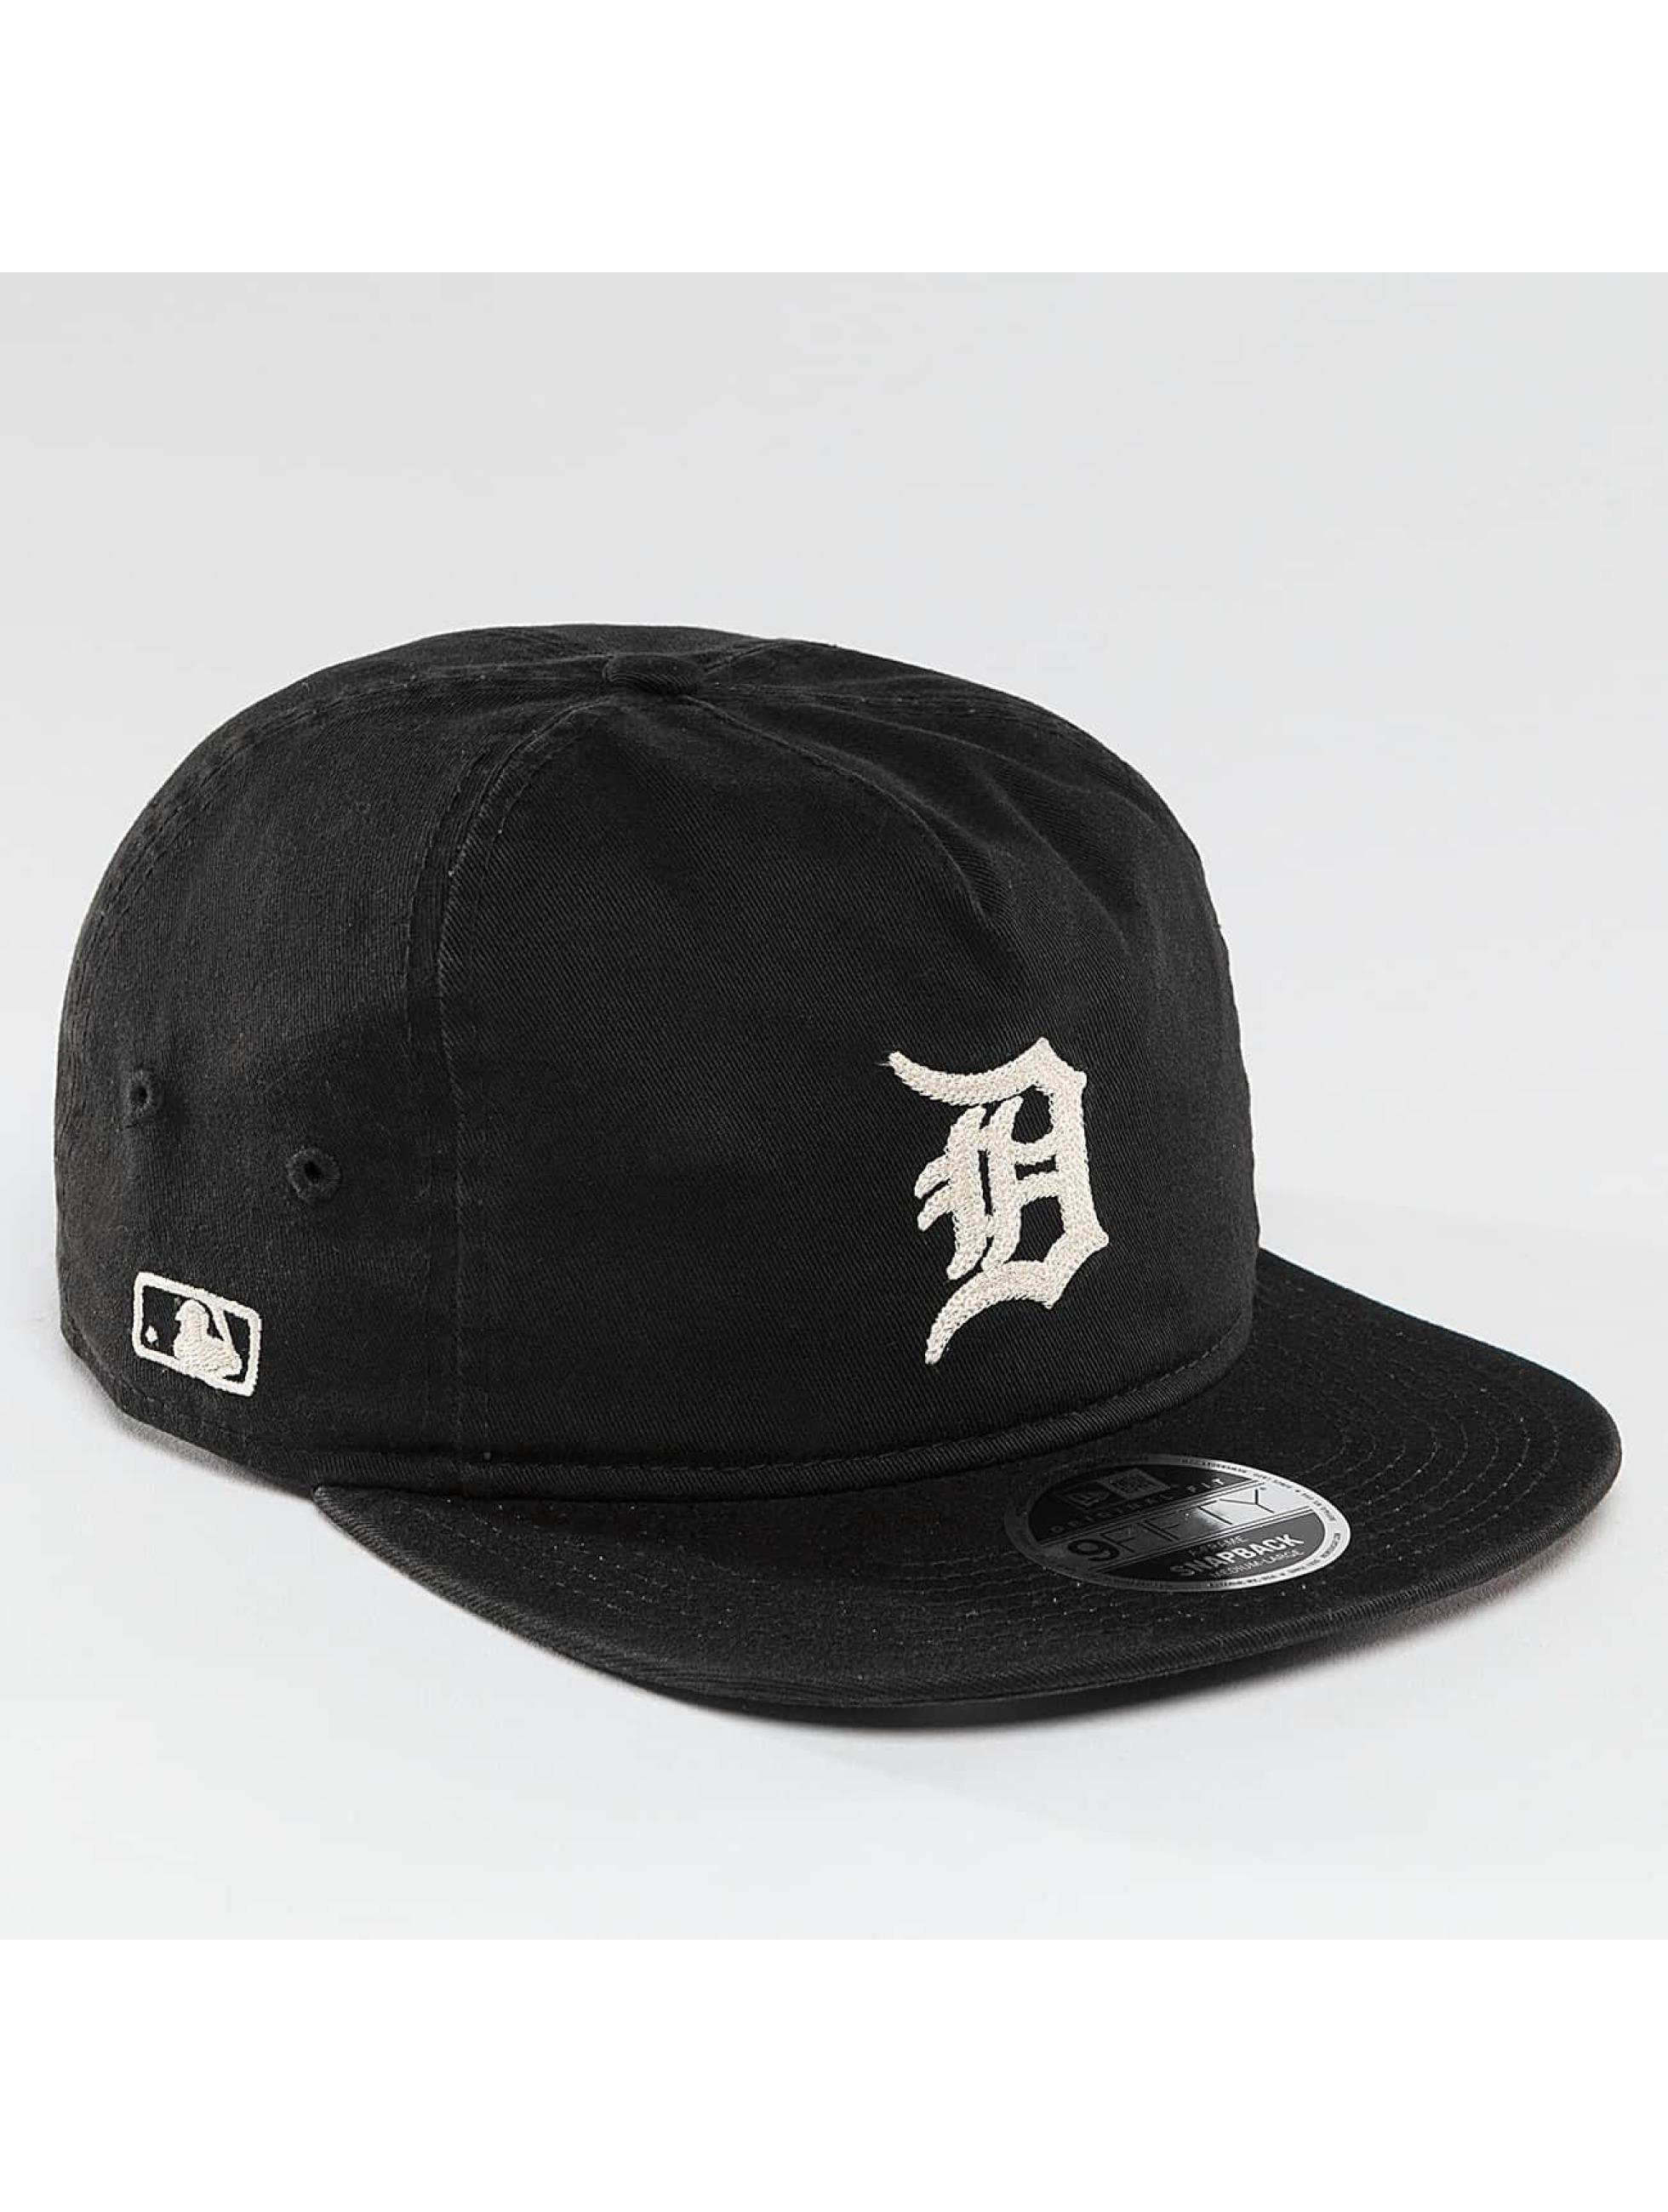 New Era Snapback Cap Chain Stitch Detroit Tigers black